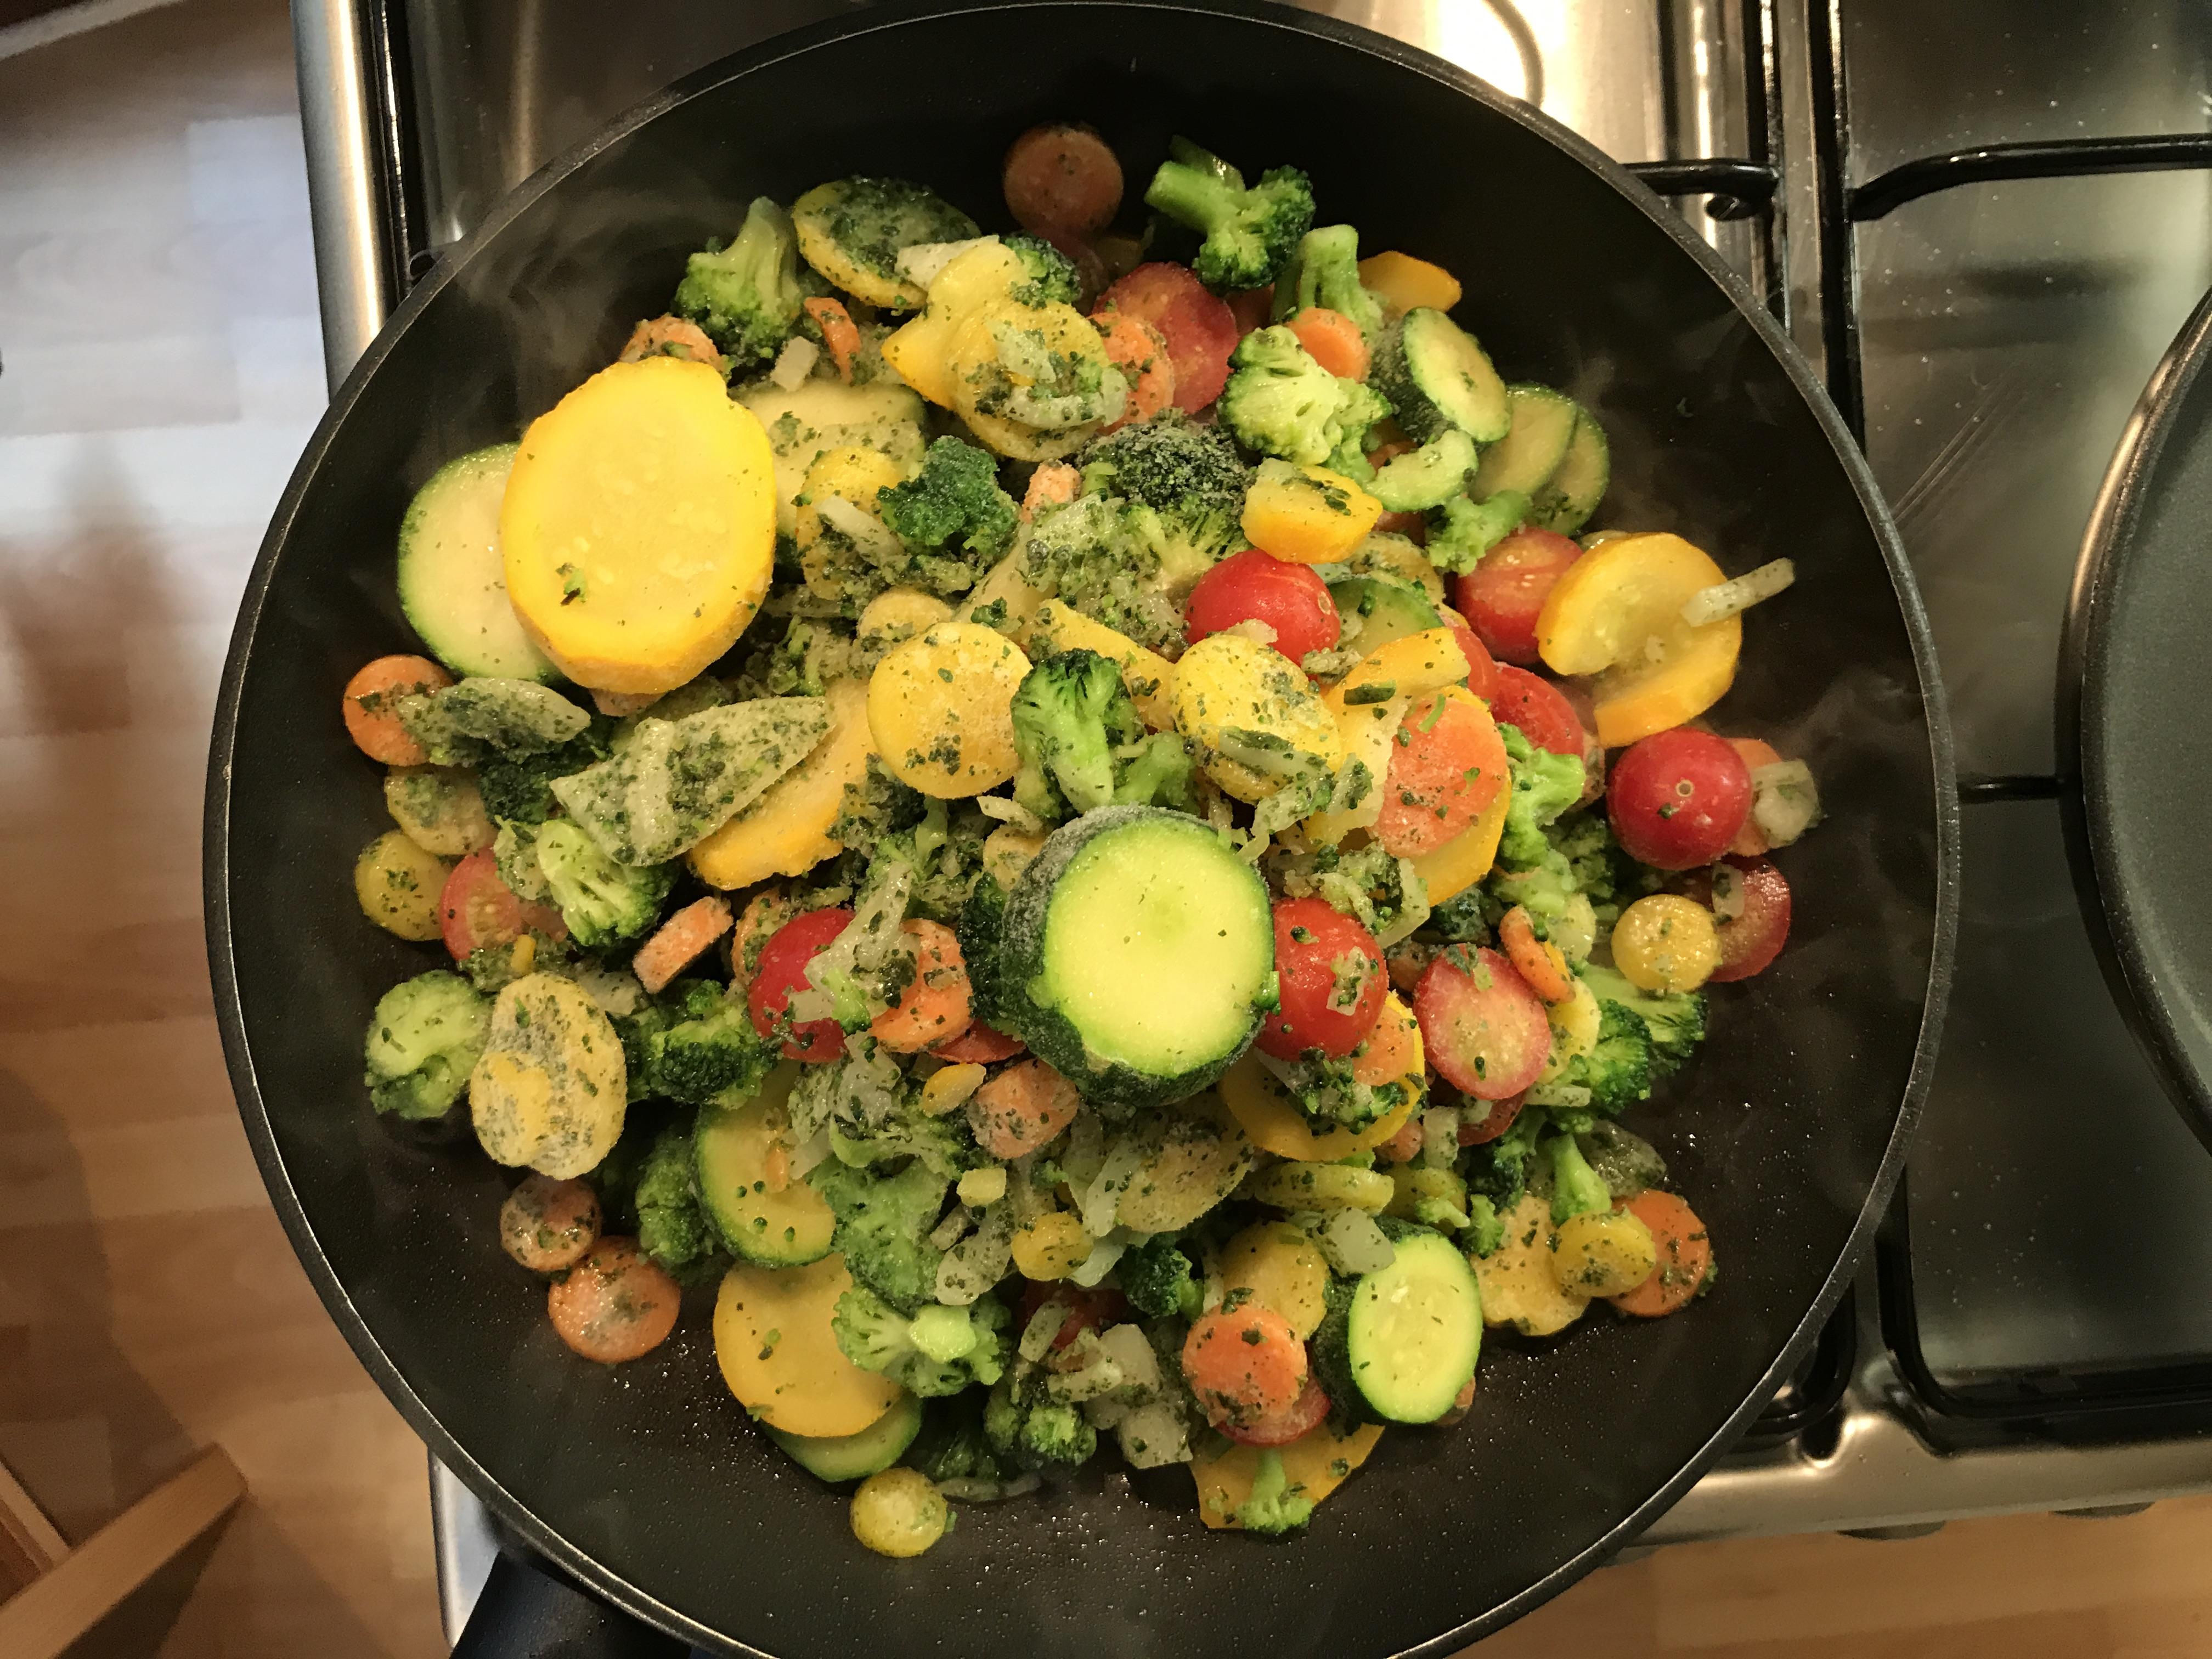 Gesunde Ernährung - 3 Regeln